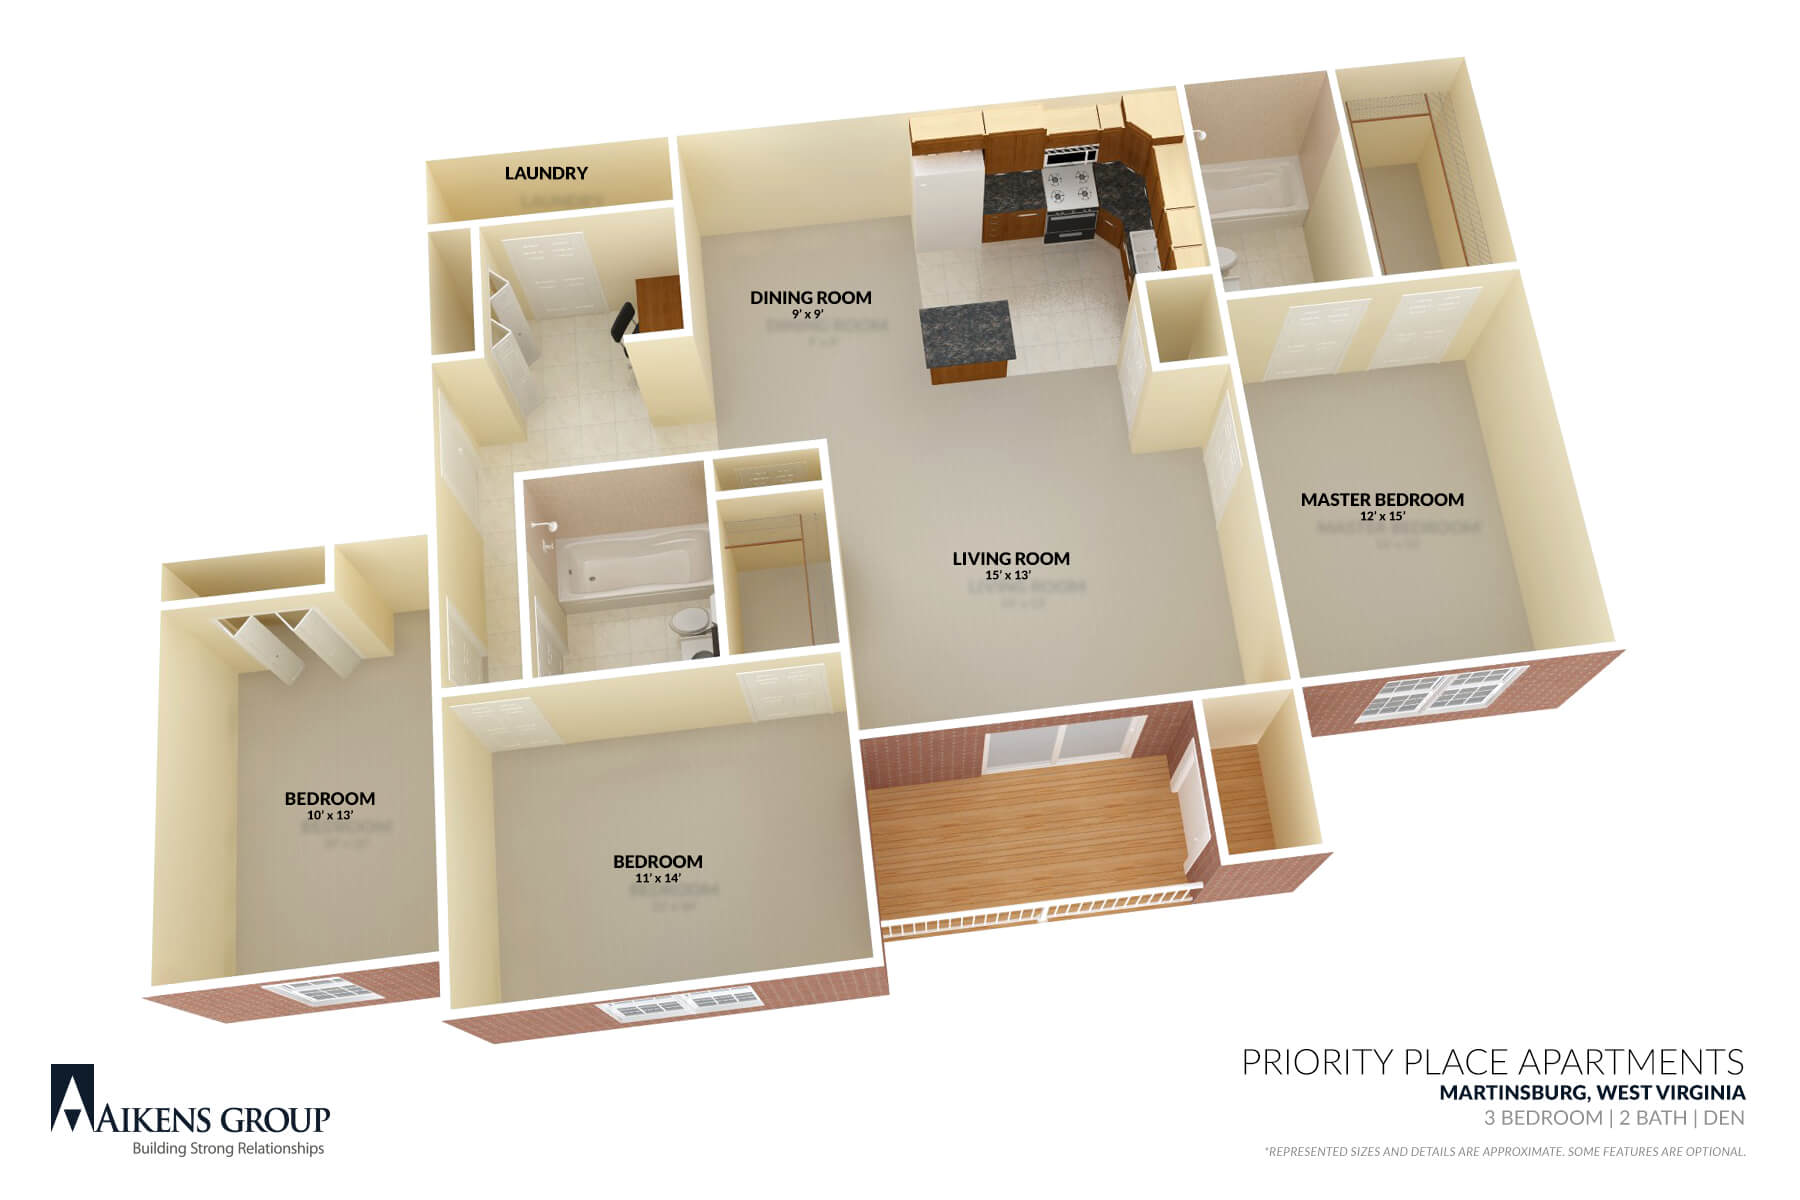 Priority Place Apartments 3BR Floorplan